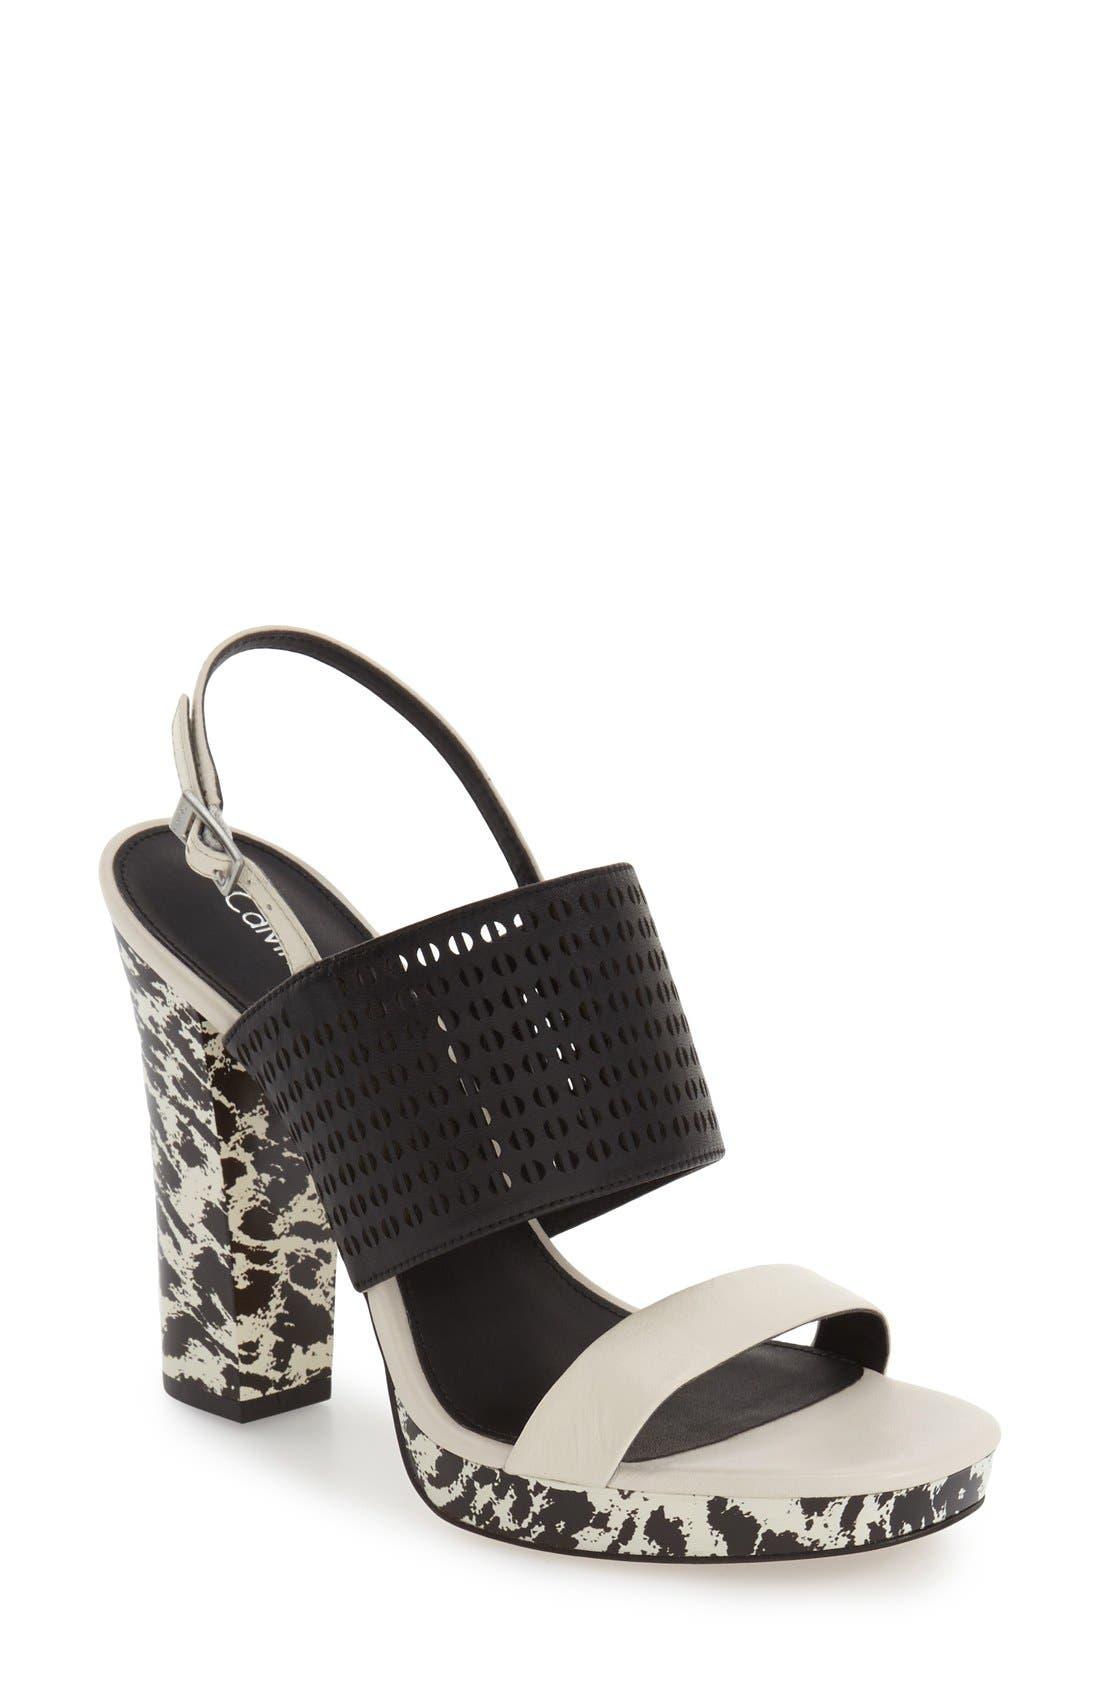 Alternate Image 1 Selected - Calvin Klein 'Breannie' Slingback Platform Sandal (Women)